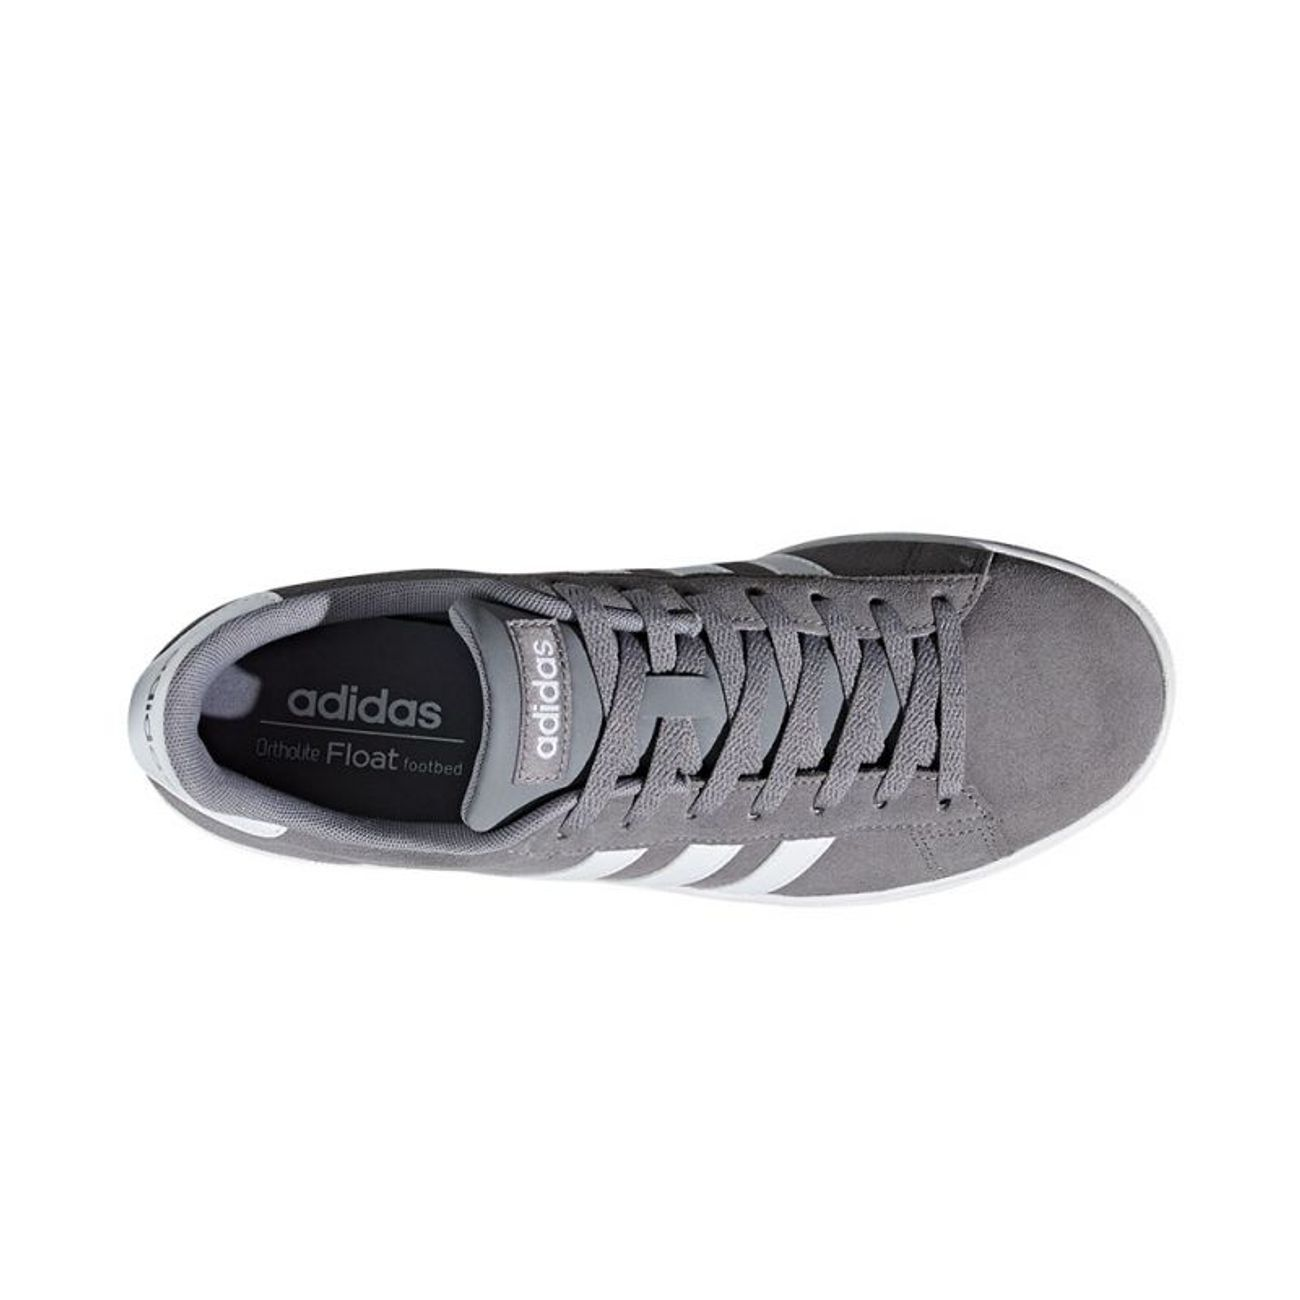 Chaussures adidas neo Daily 2.0 gris foncé blanc – achat pas